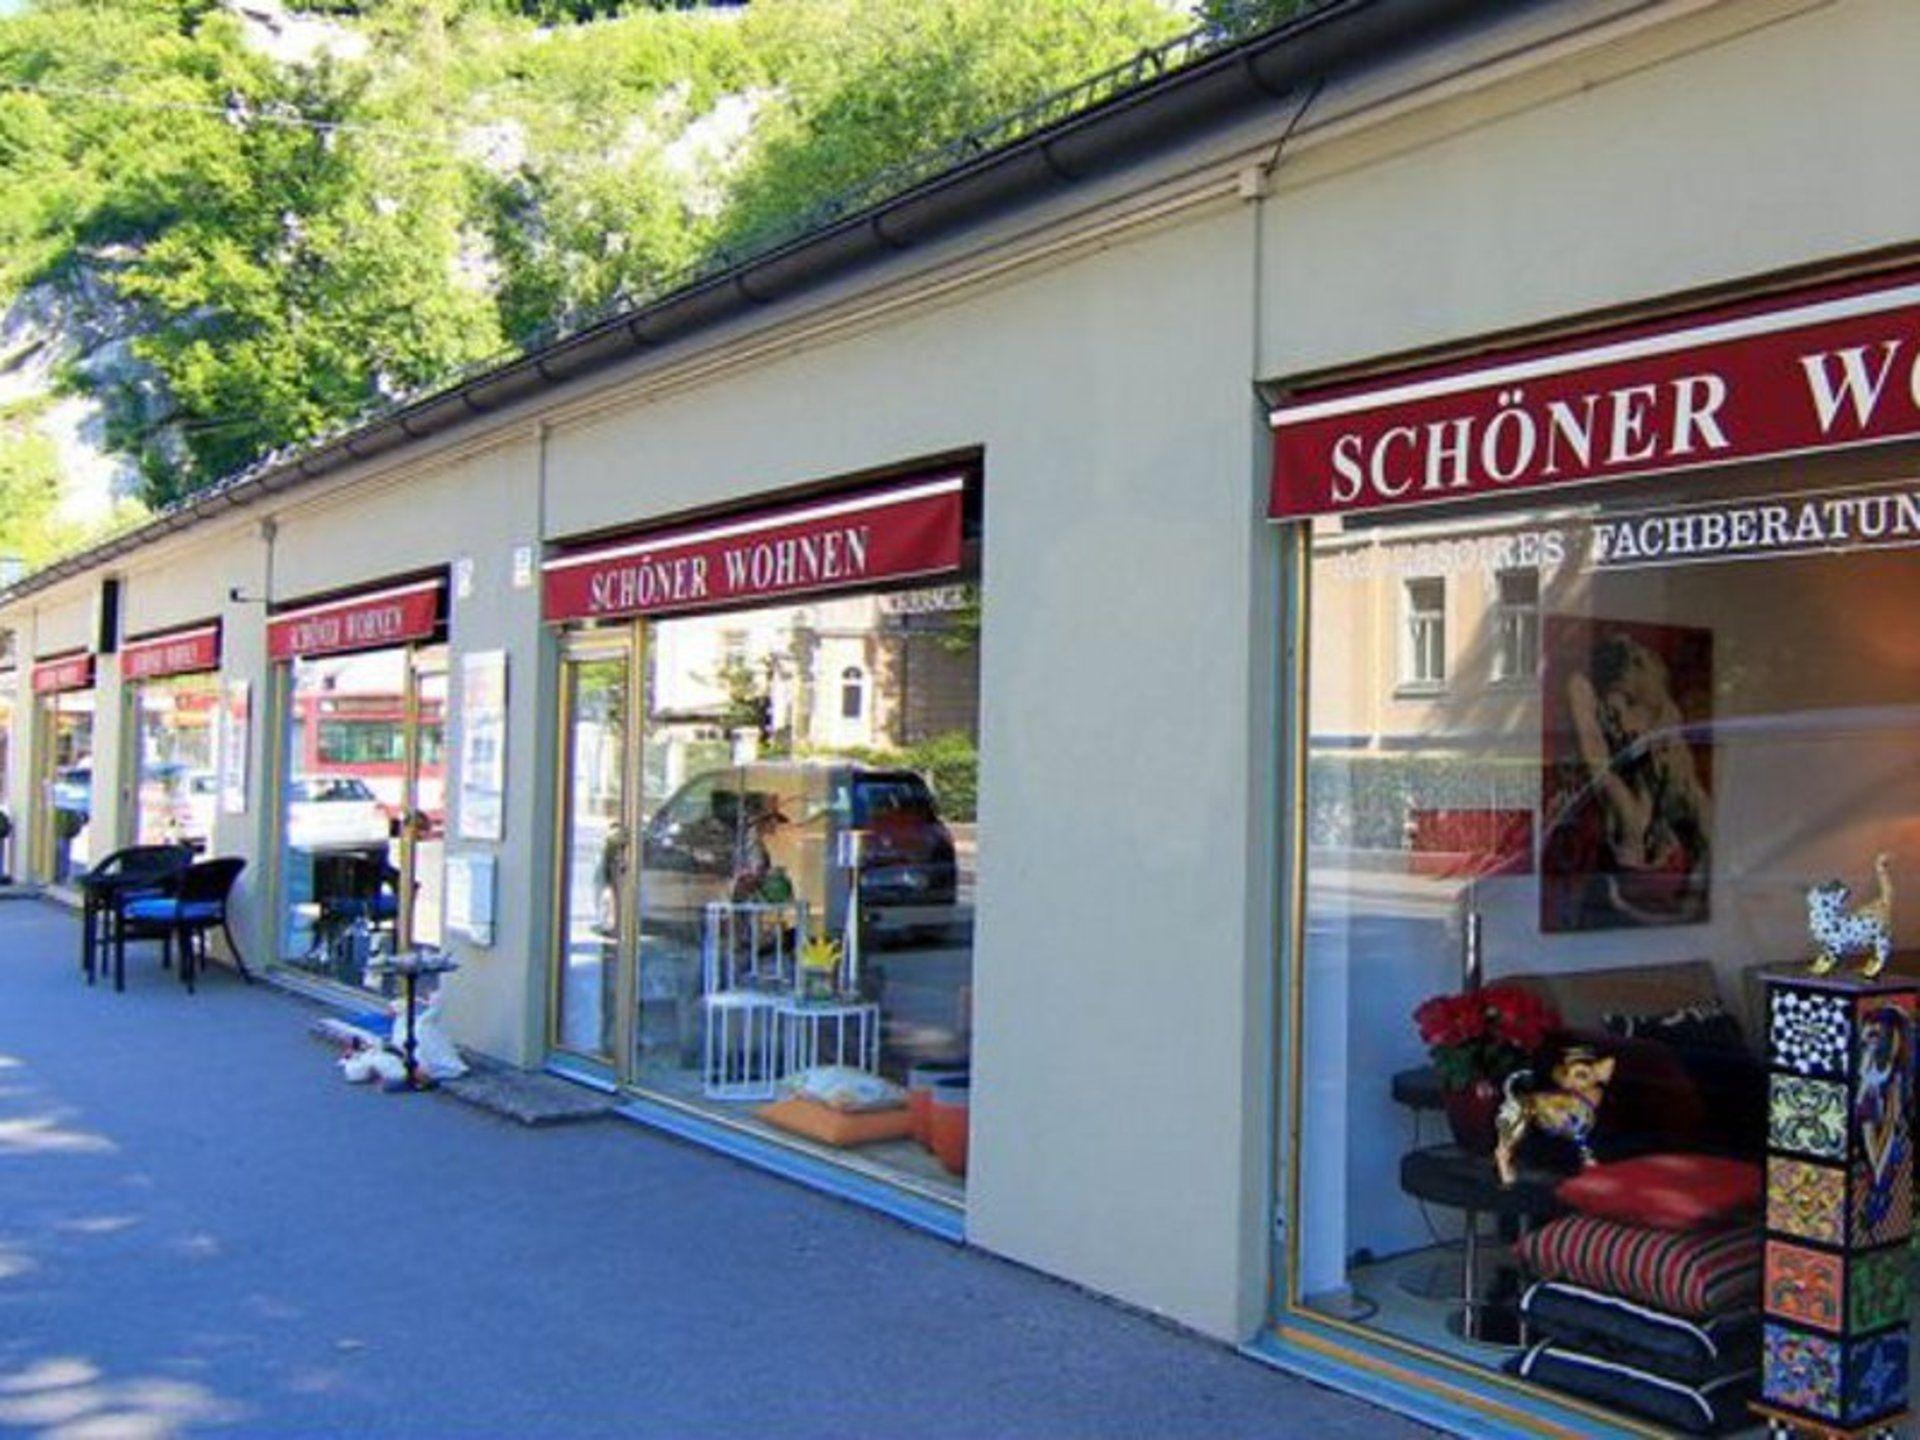 Dr.-Franz-Rehrl-Platz 3 / Imbergstraße 35-55 / Arenbergstraße 2, 5020 Salzburg